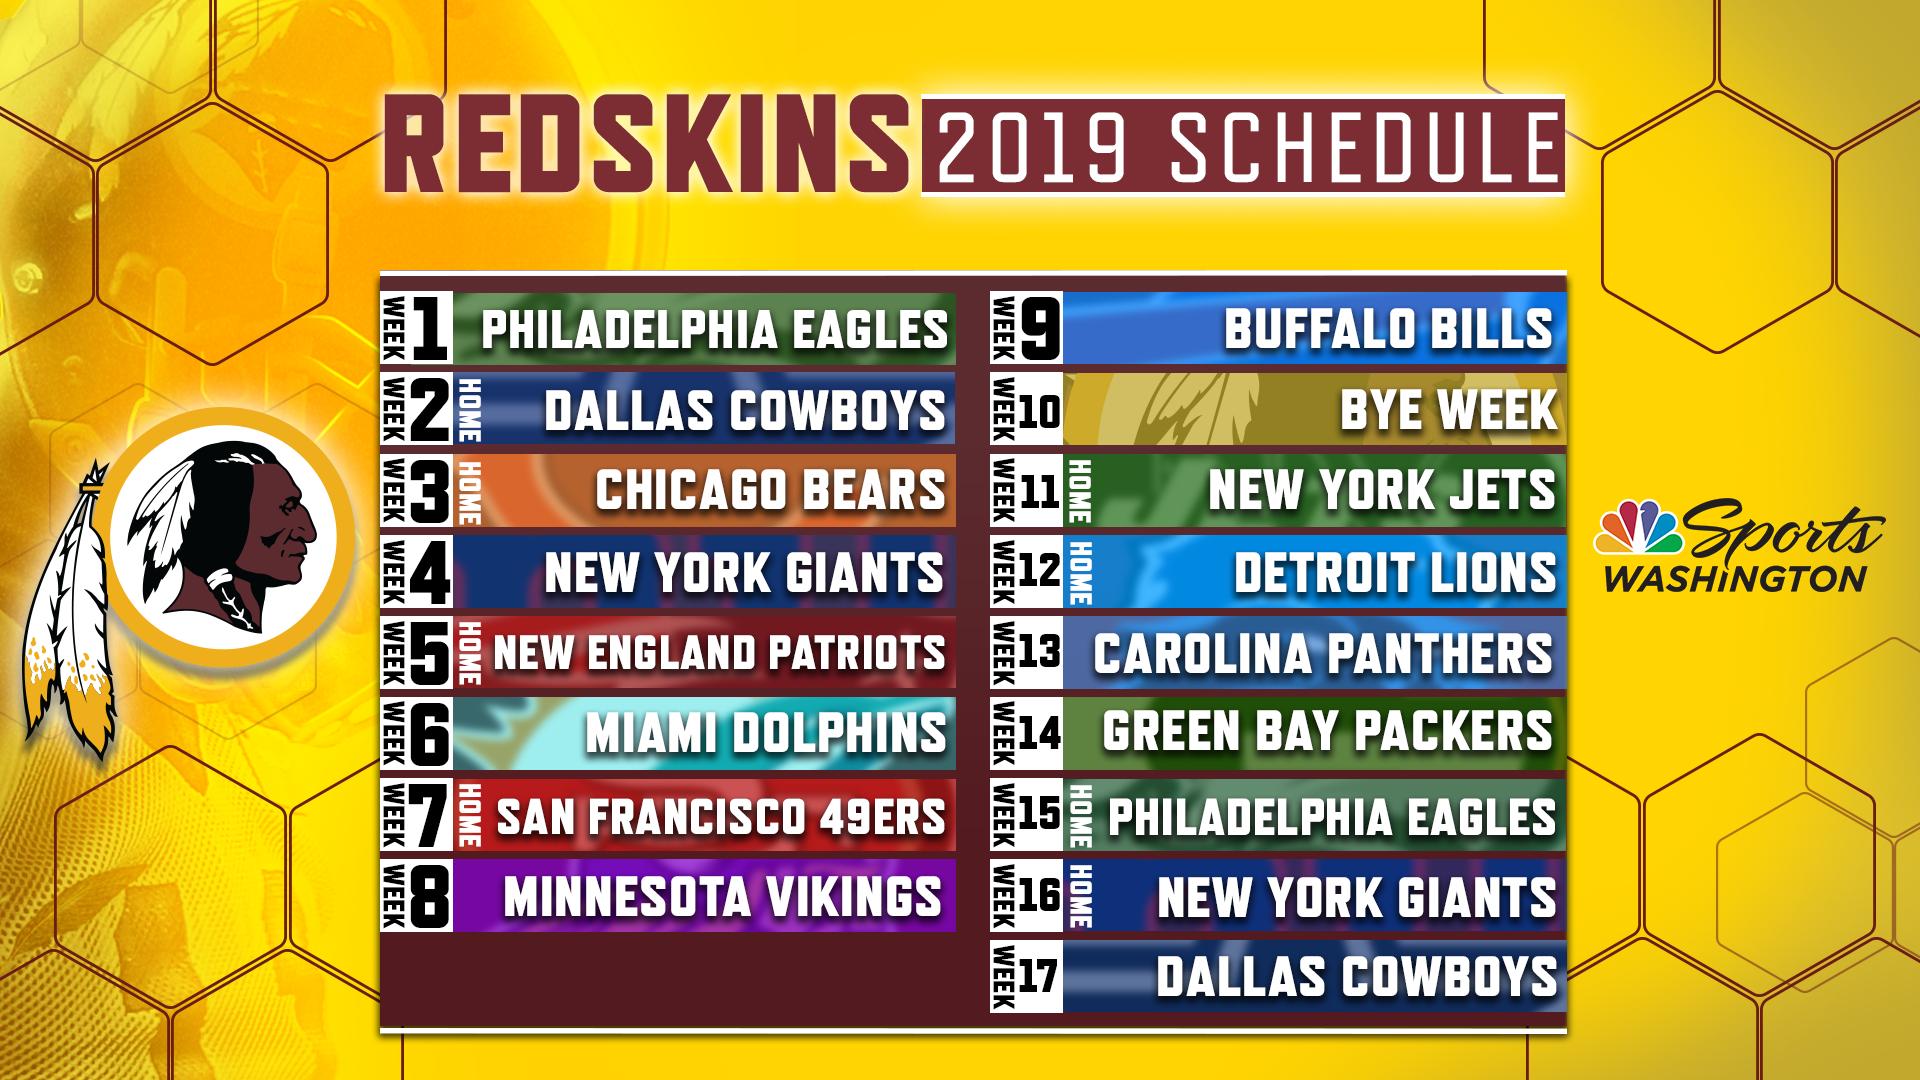 Redskins release official 2019 regular season schedule NBC 1920x1080